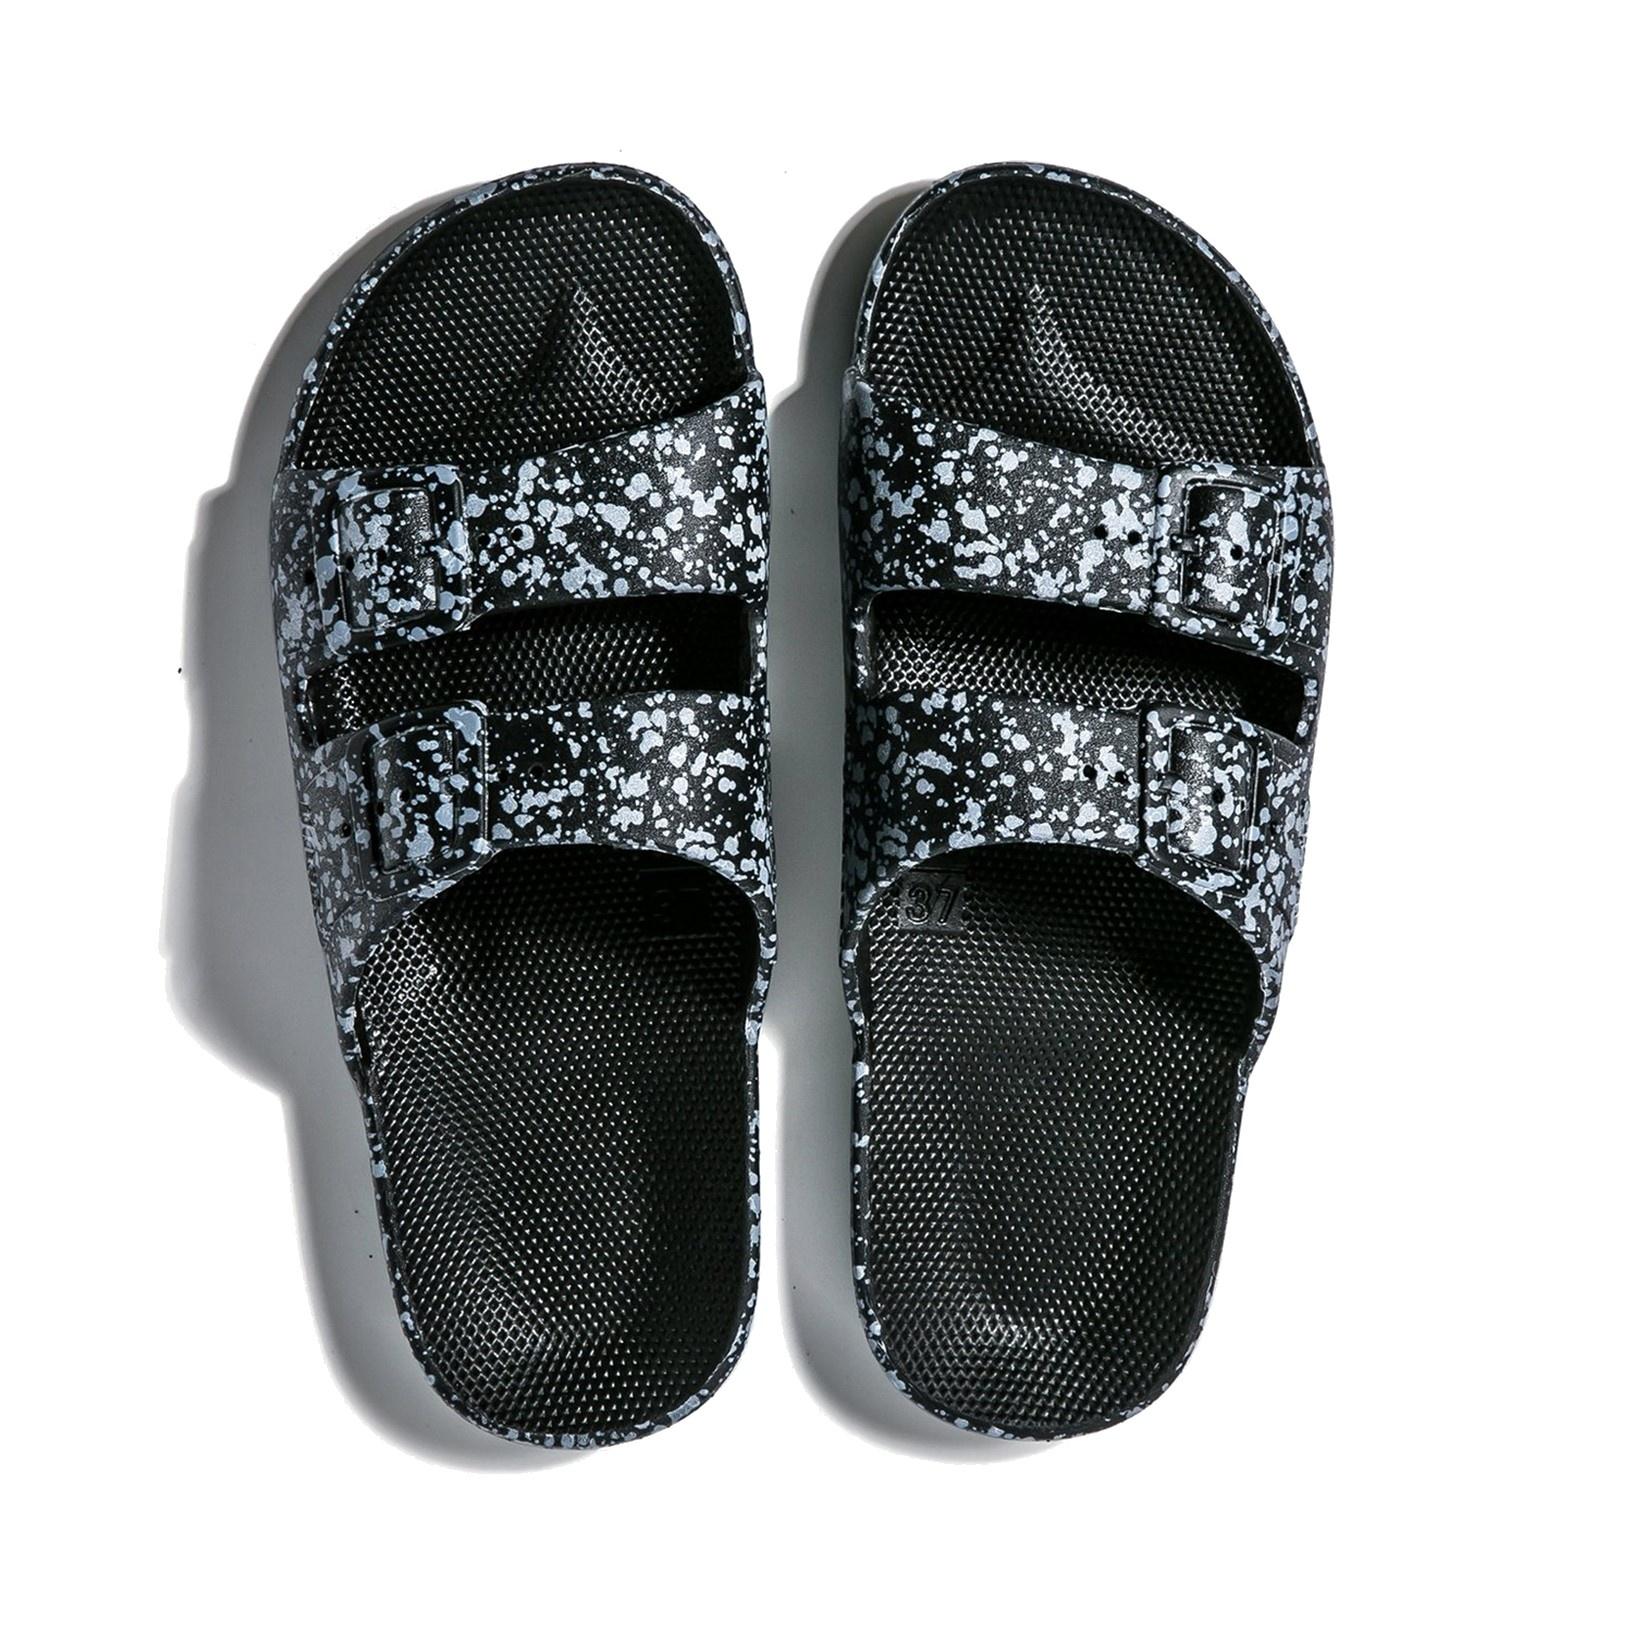 Freedom Moses Slide Sandals Black Splatter